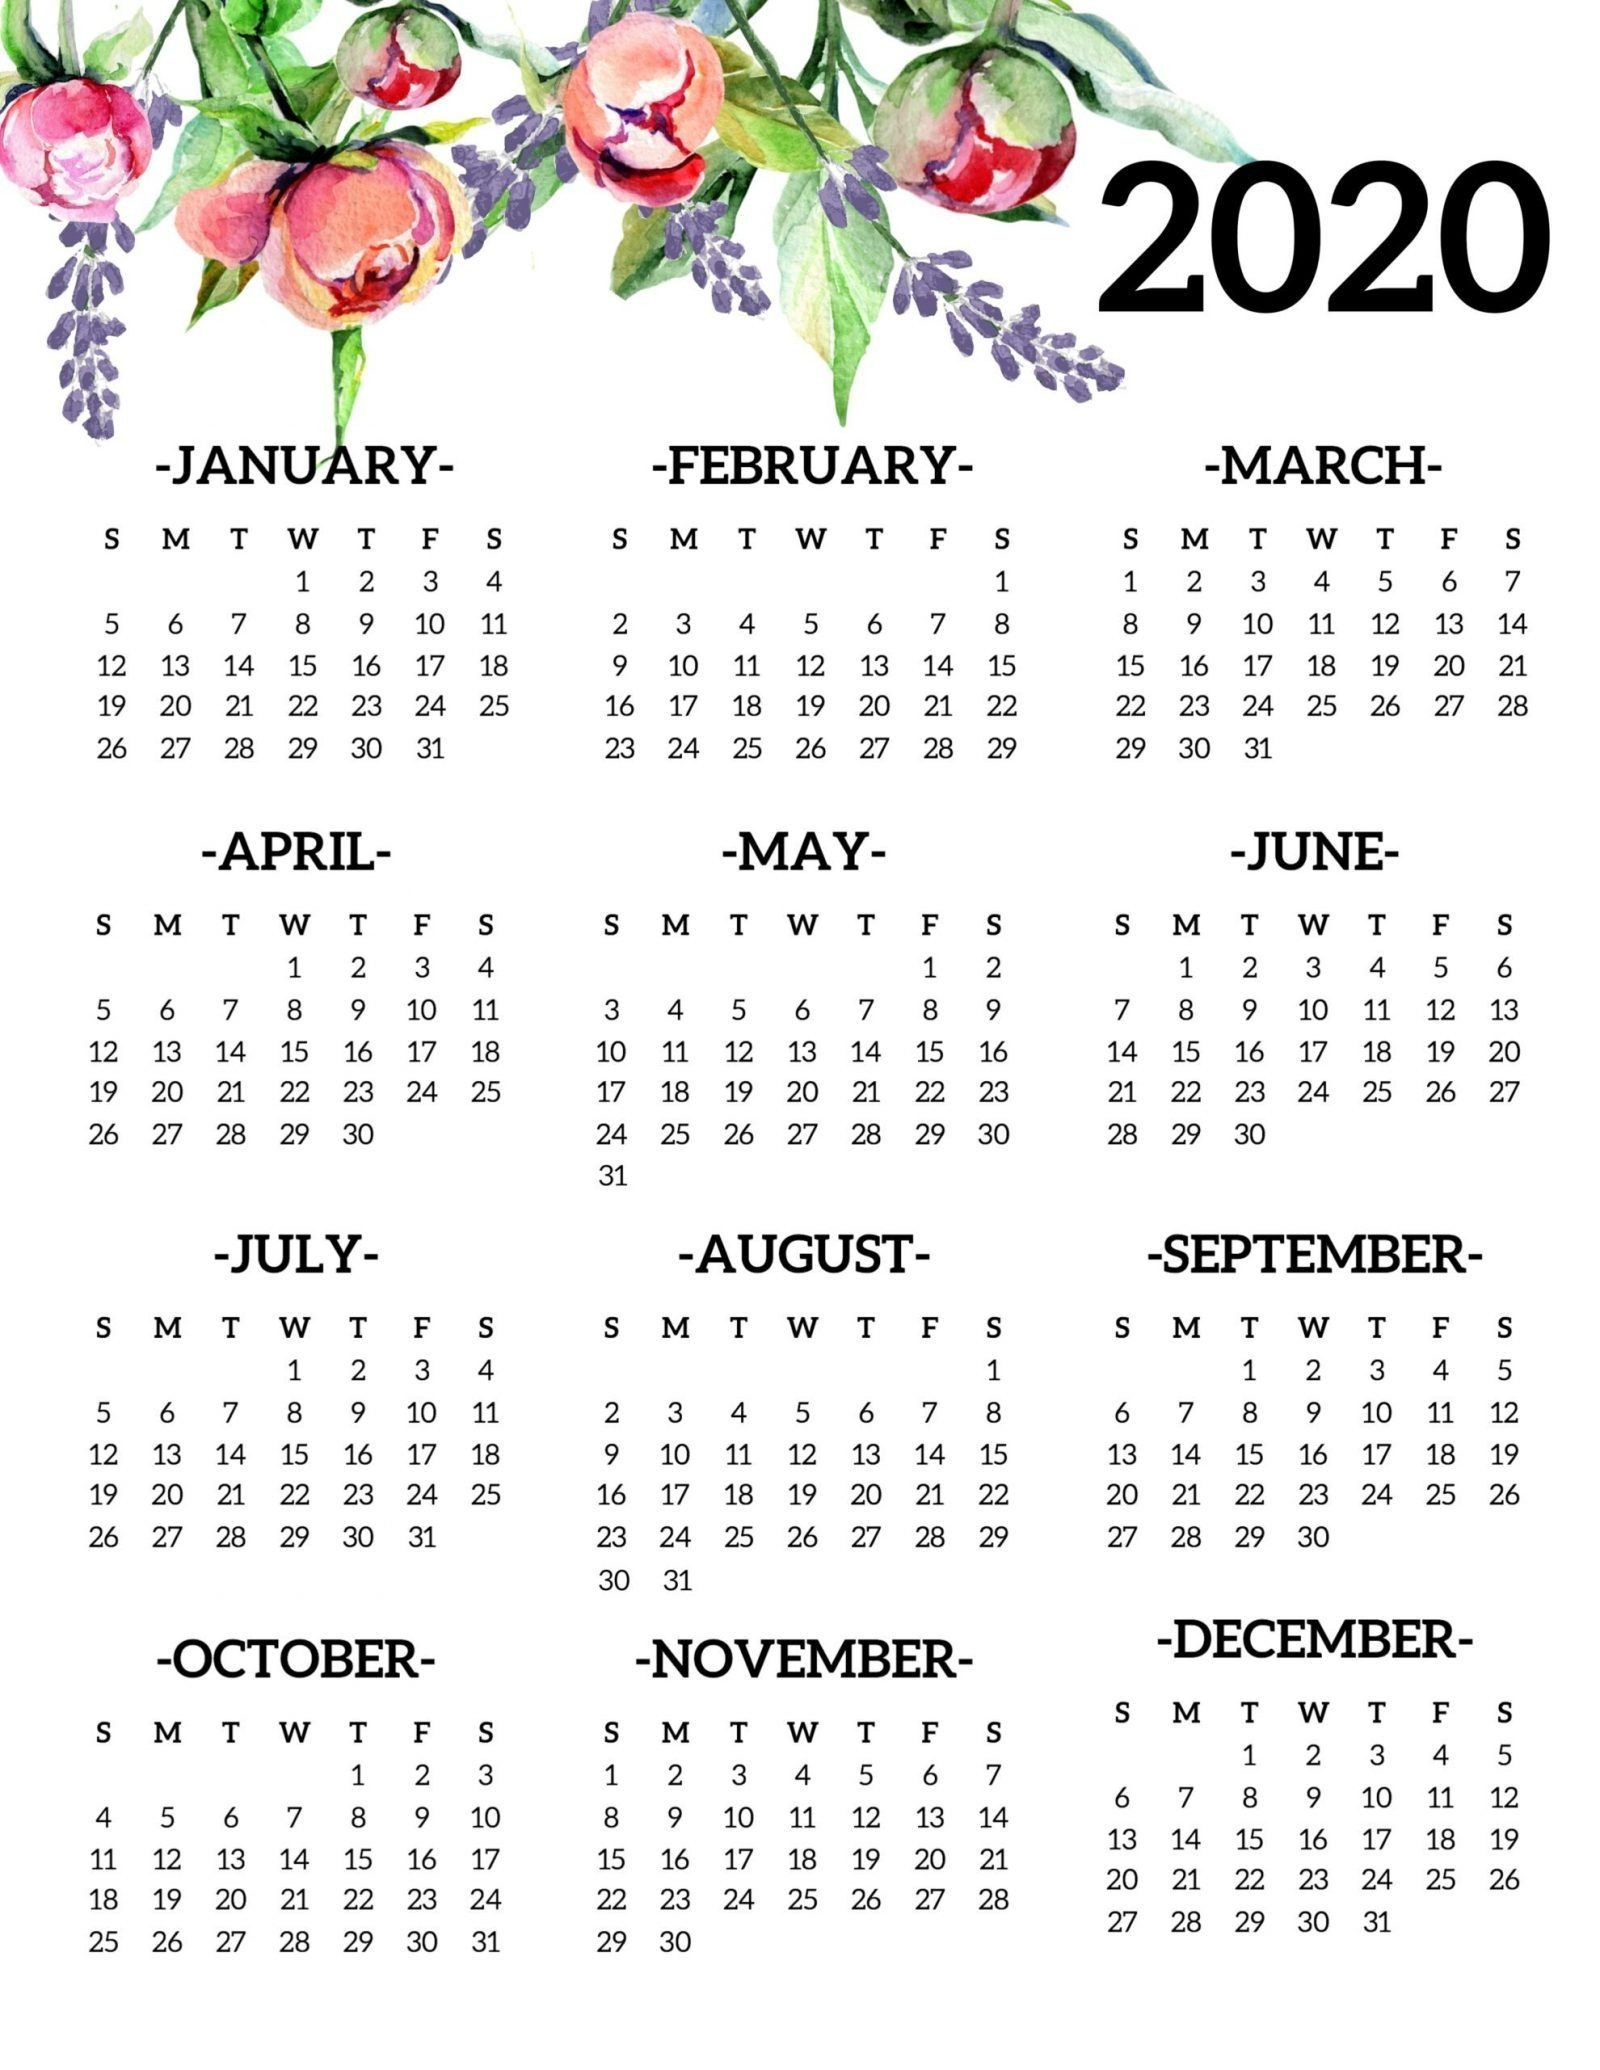 20 Free Printable Calendars For 2020 | Free Printable  Year 2020 Calendar Printable